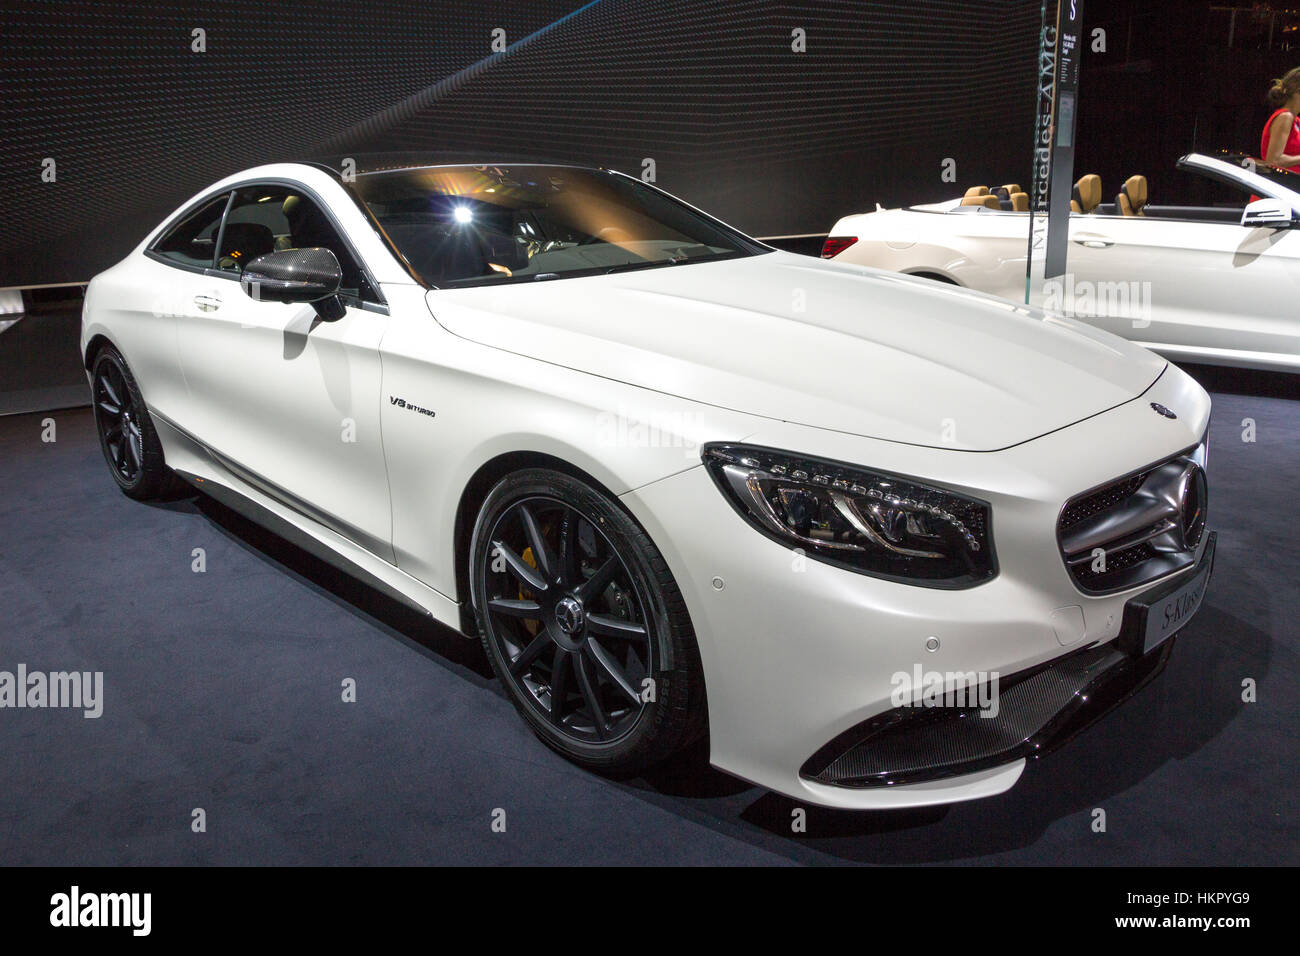 https://c8.alamy.com/comp/HKPYG9/amsterdam-april-16-2015-mercedes-benz-s-class-coupe-2014-at-the-autorai-HKPYG9.jpg